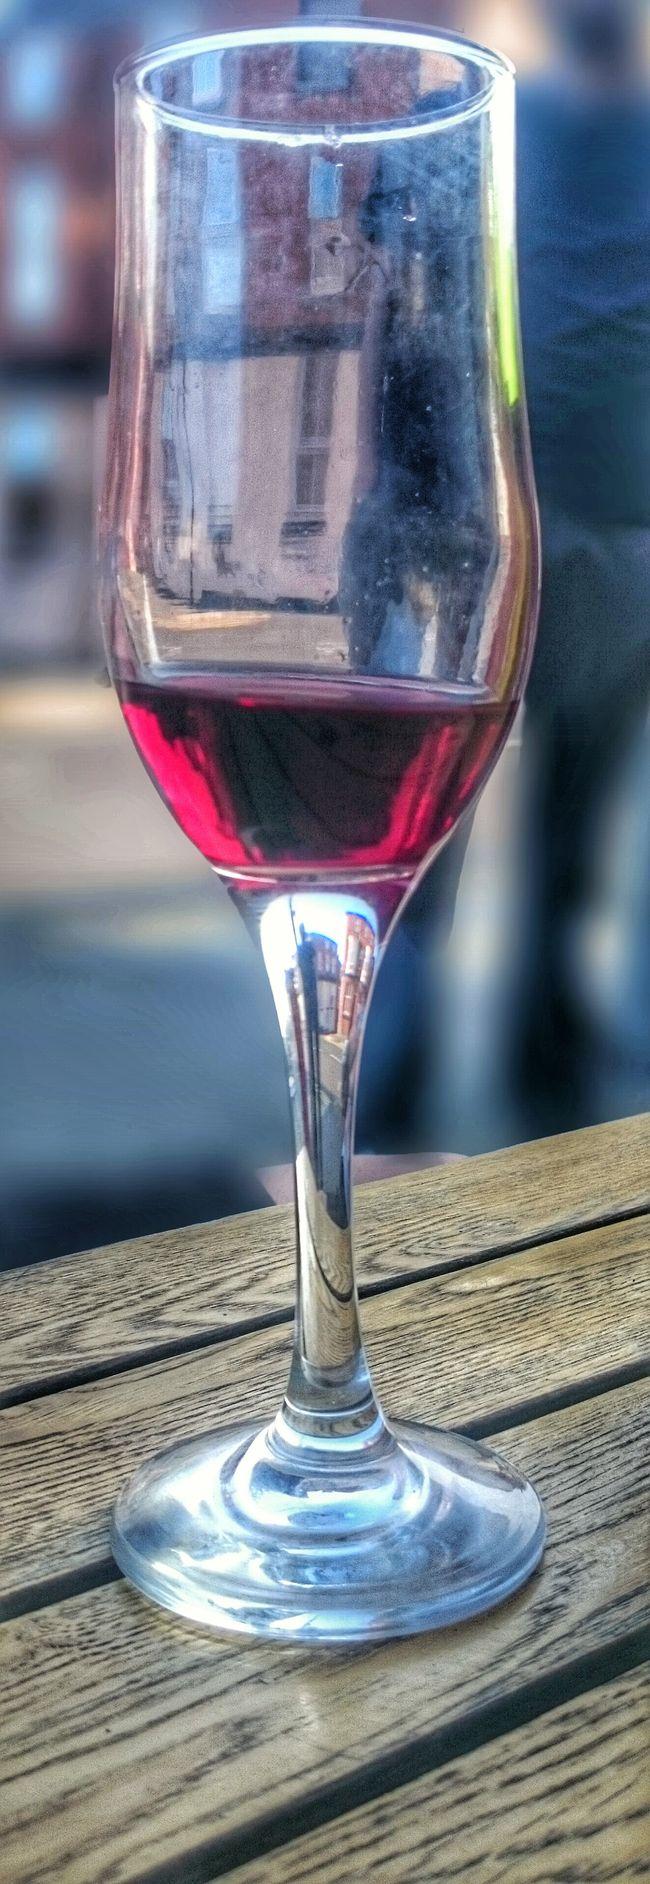 Wine Wineglass Red Rioja Reflection Defocus Backgound Defocus Summer Food And Drink Alchol Fine Art Photography